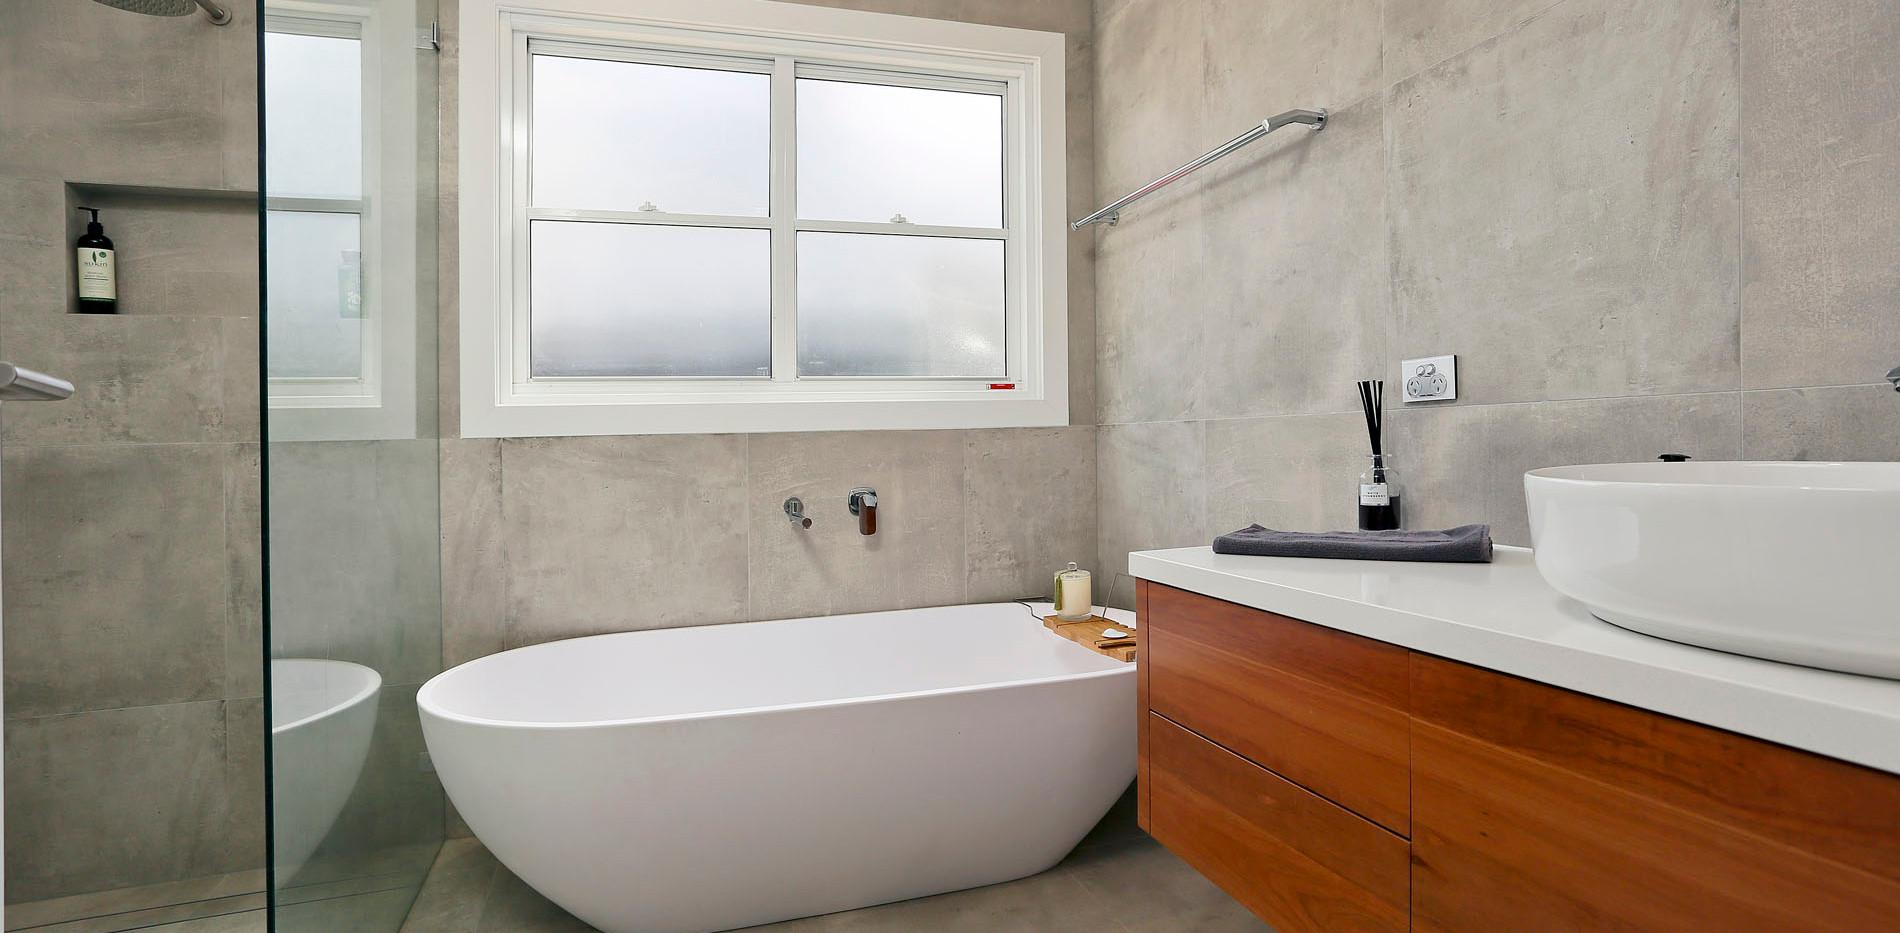 Hawkesbury bathrooms and Kitchens (19)